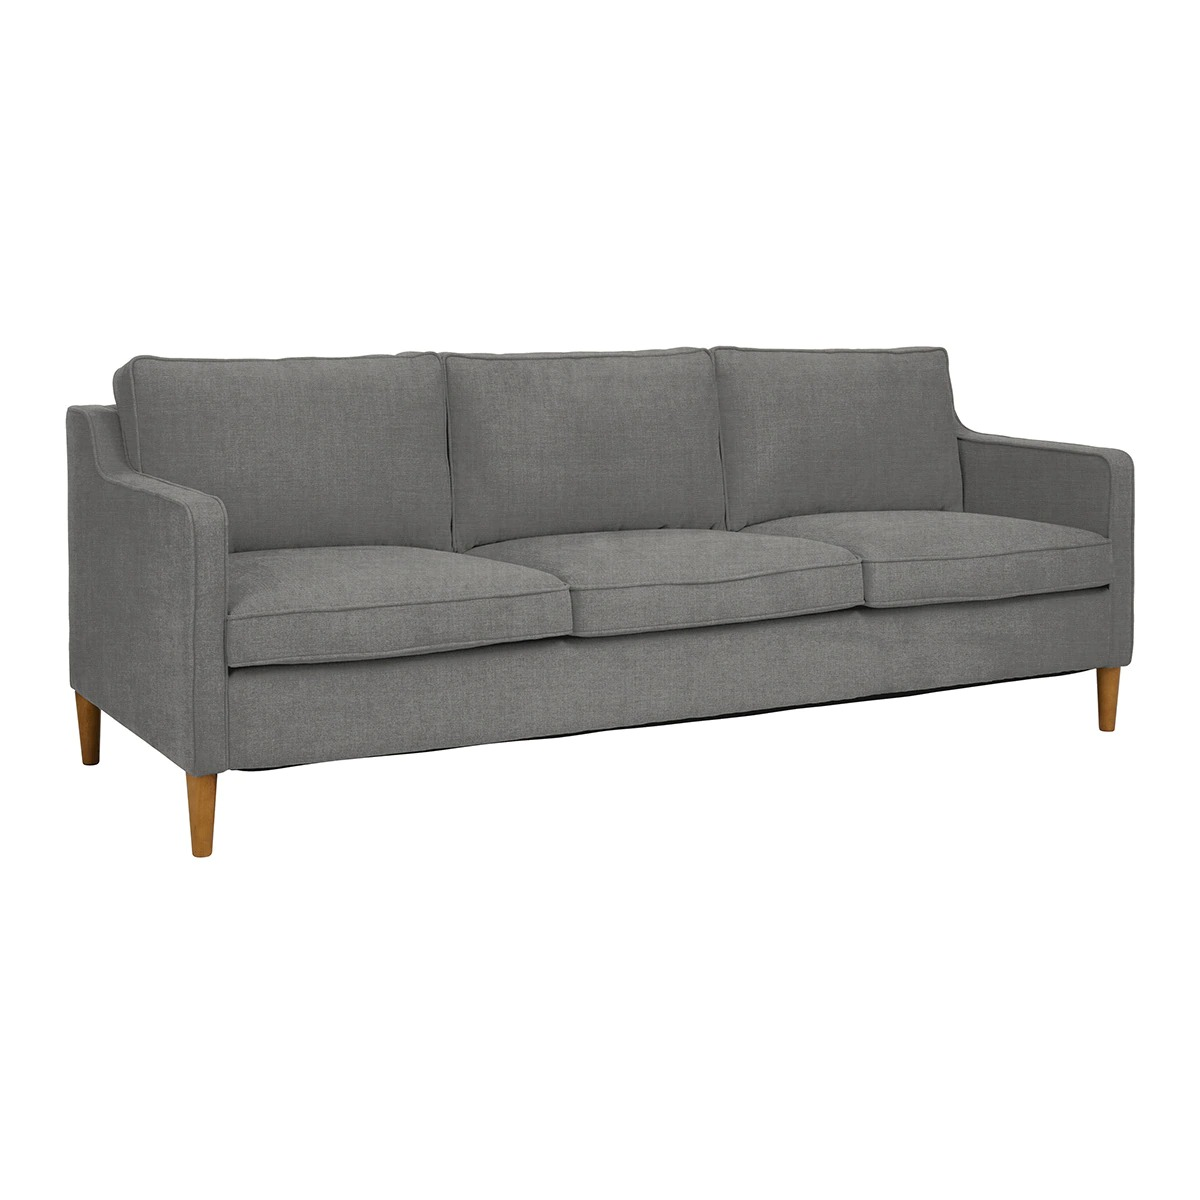 Montreal Corte Inglés 3-seater upholstered sofa Measurements: 227 (width) x 76 (height) x 91 (depth) cm